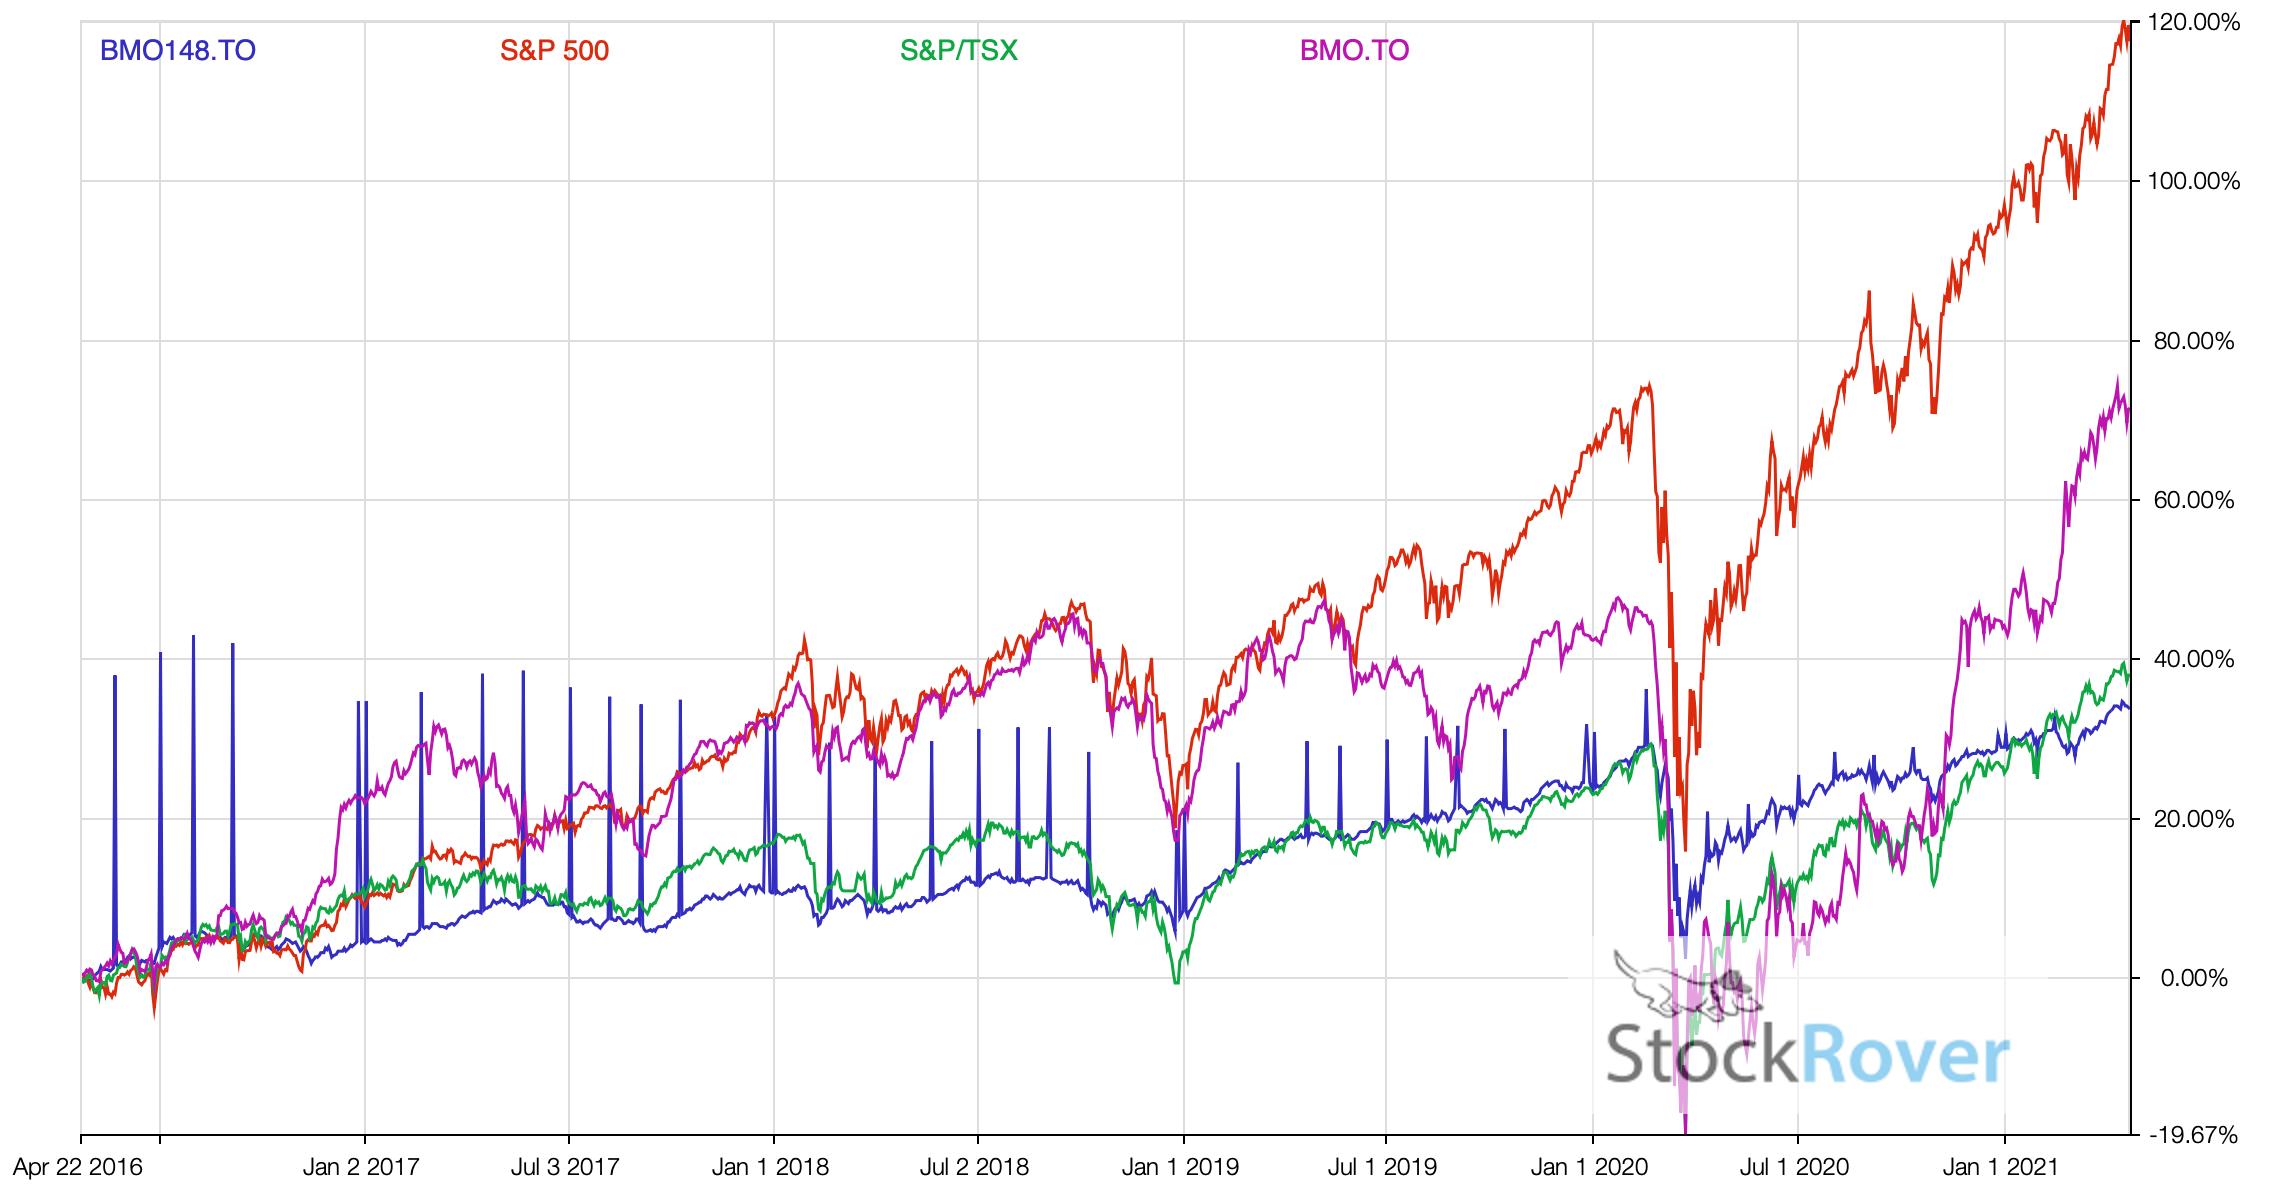 BMO Income Fund vs BMO Stock 2021